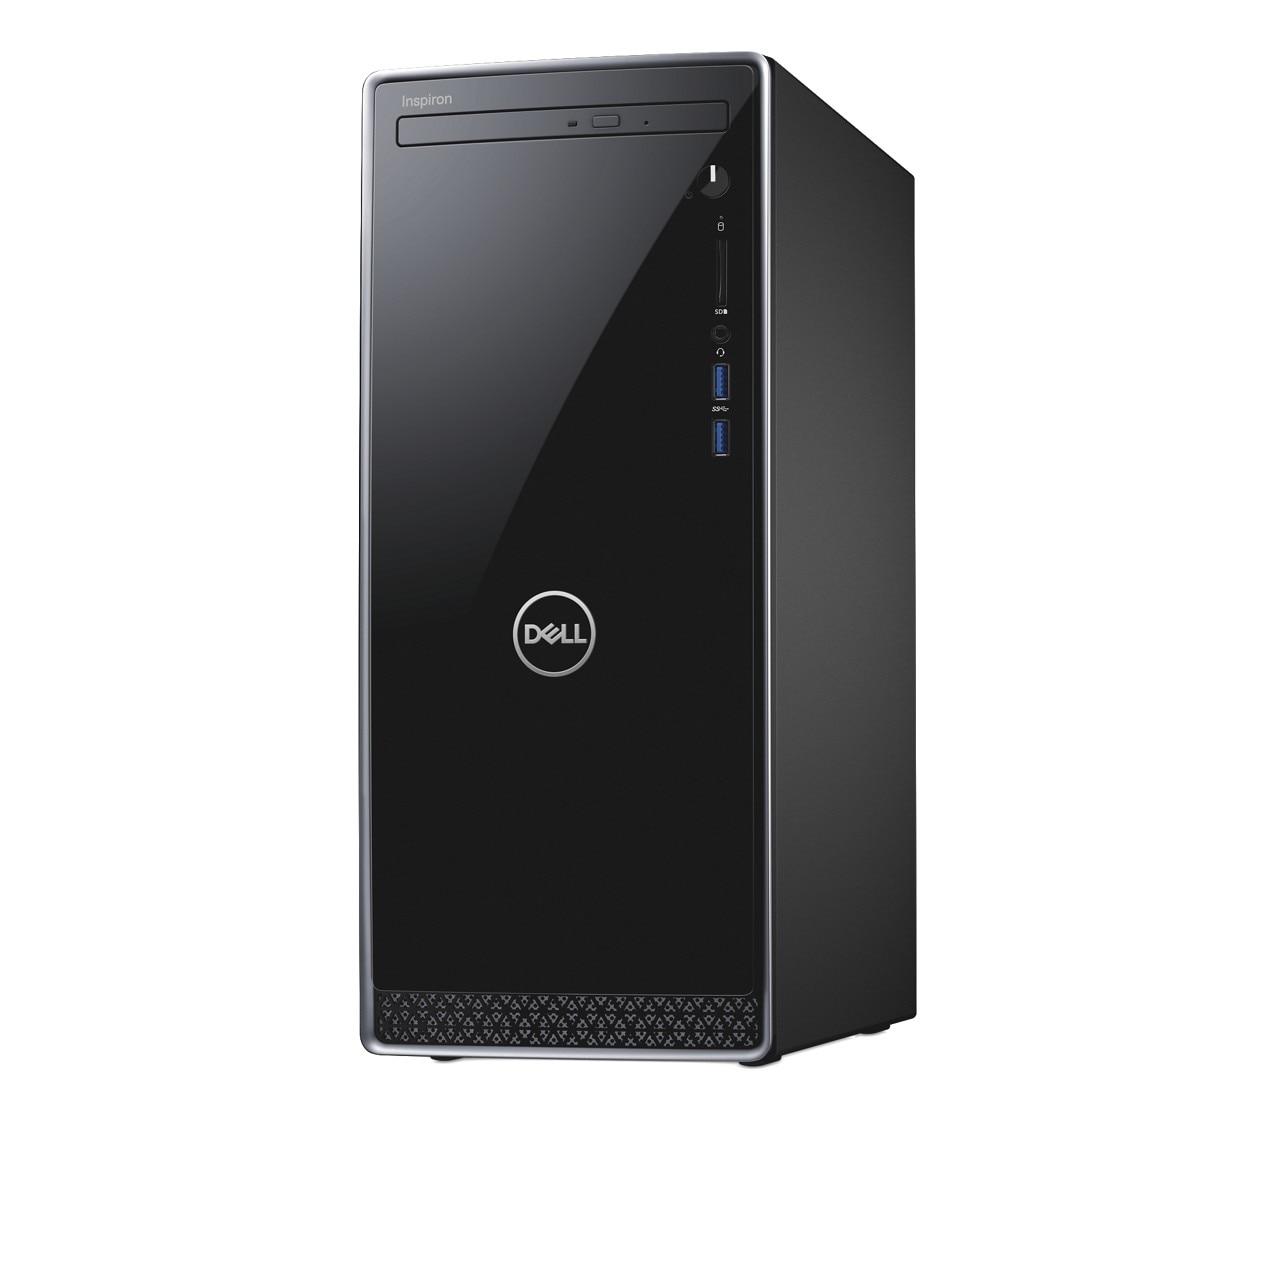 Inspiron 3670 Desktop